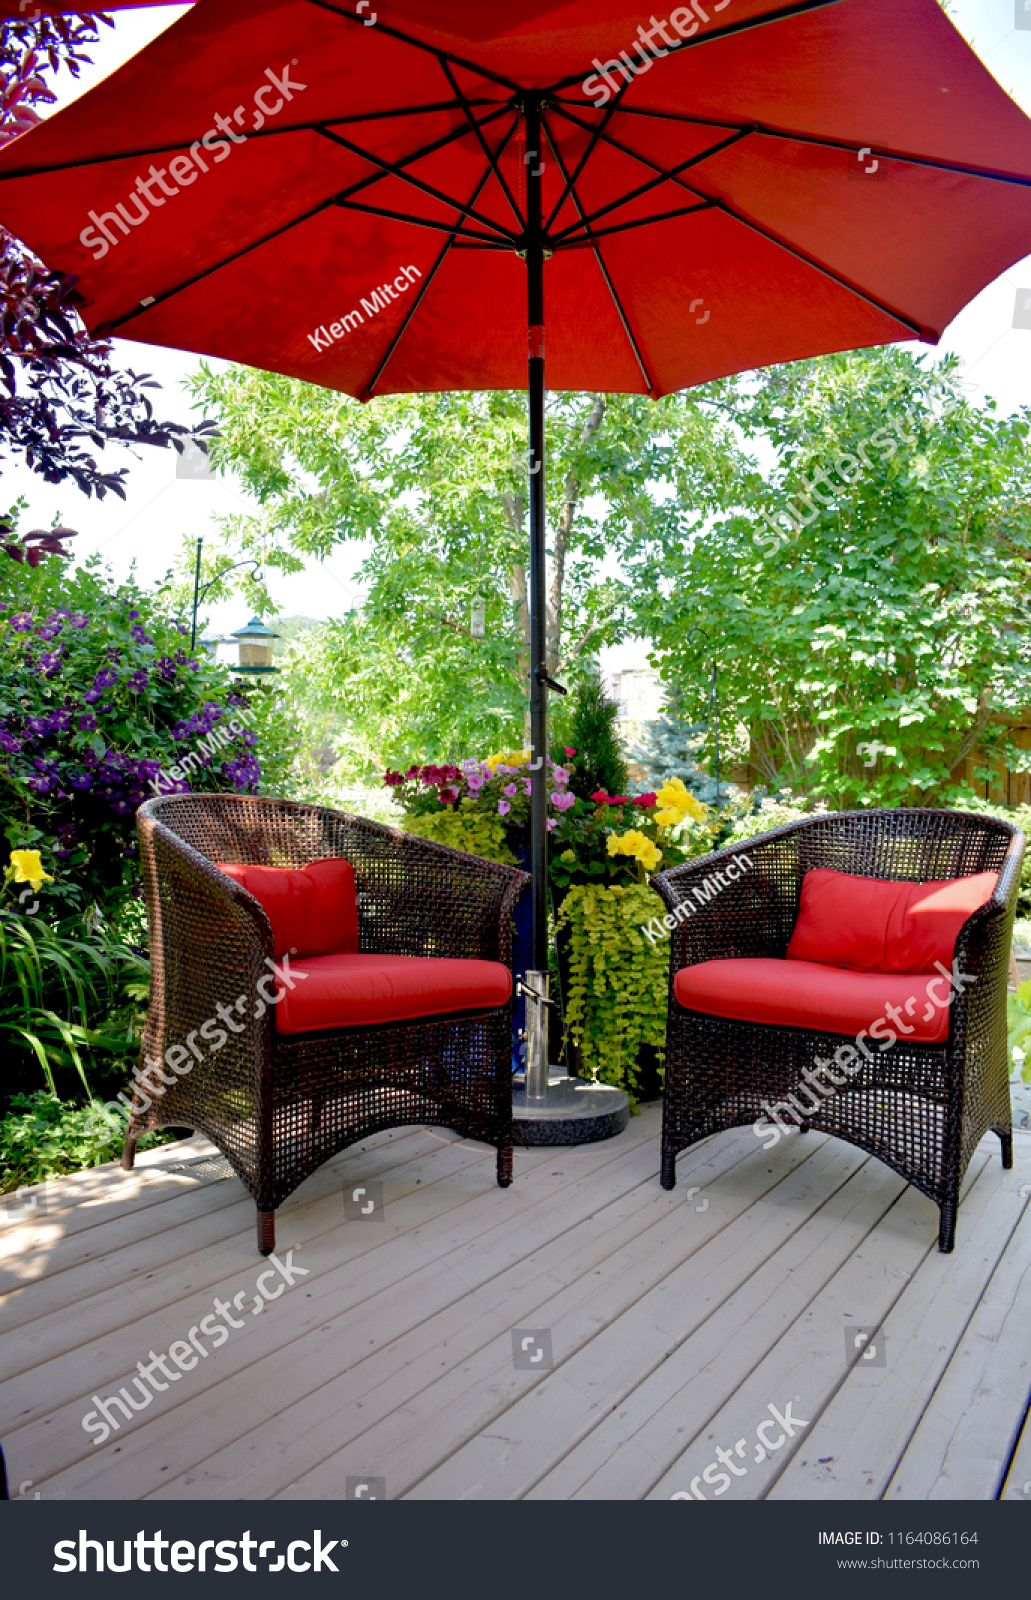 https www shutterstock com image photo red patio furniture under umbrella on 1164086164